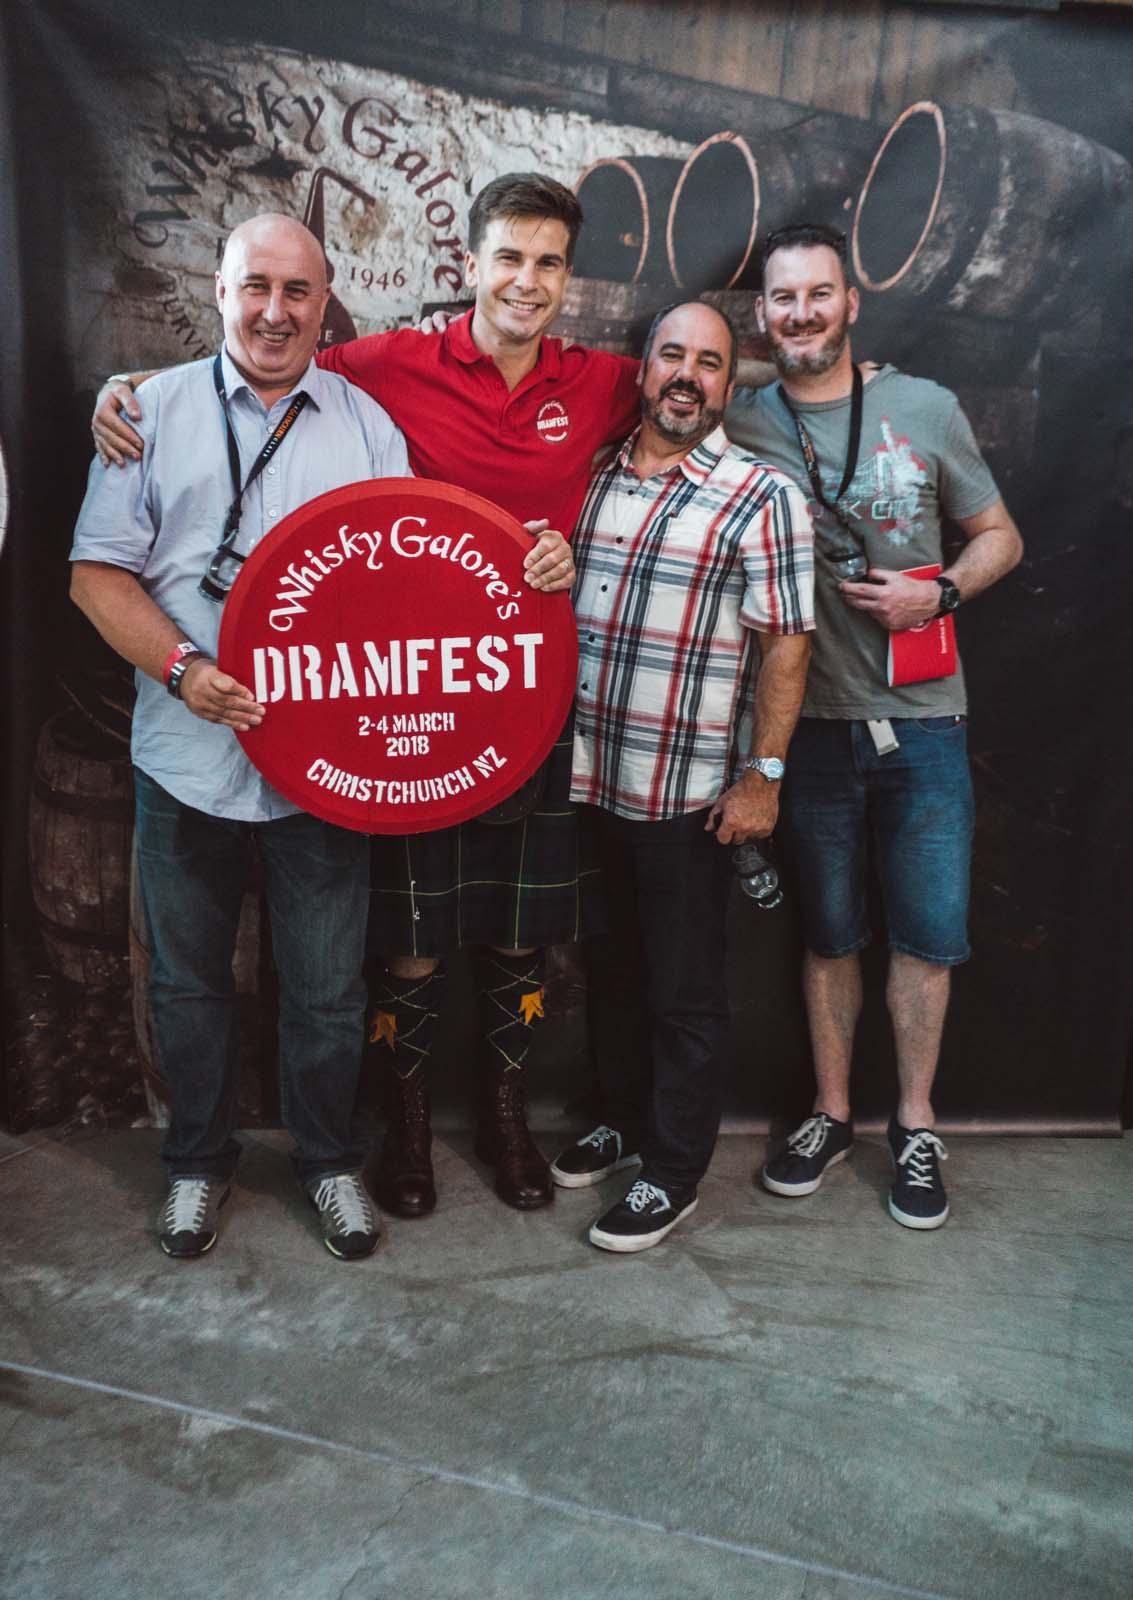 Dramfest 2018 for Whisky Galore-155.jpg